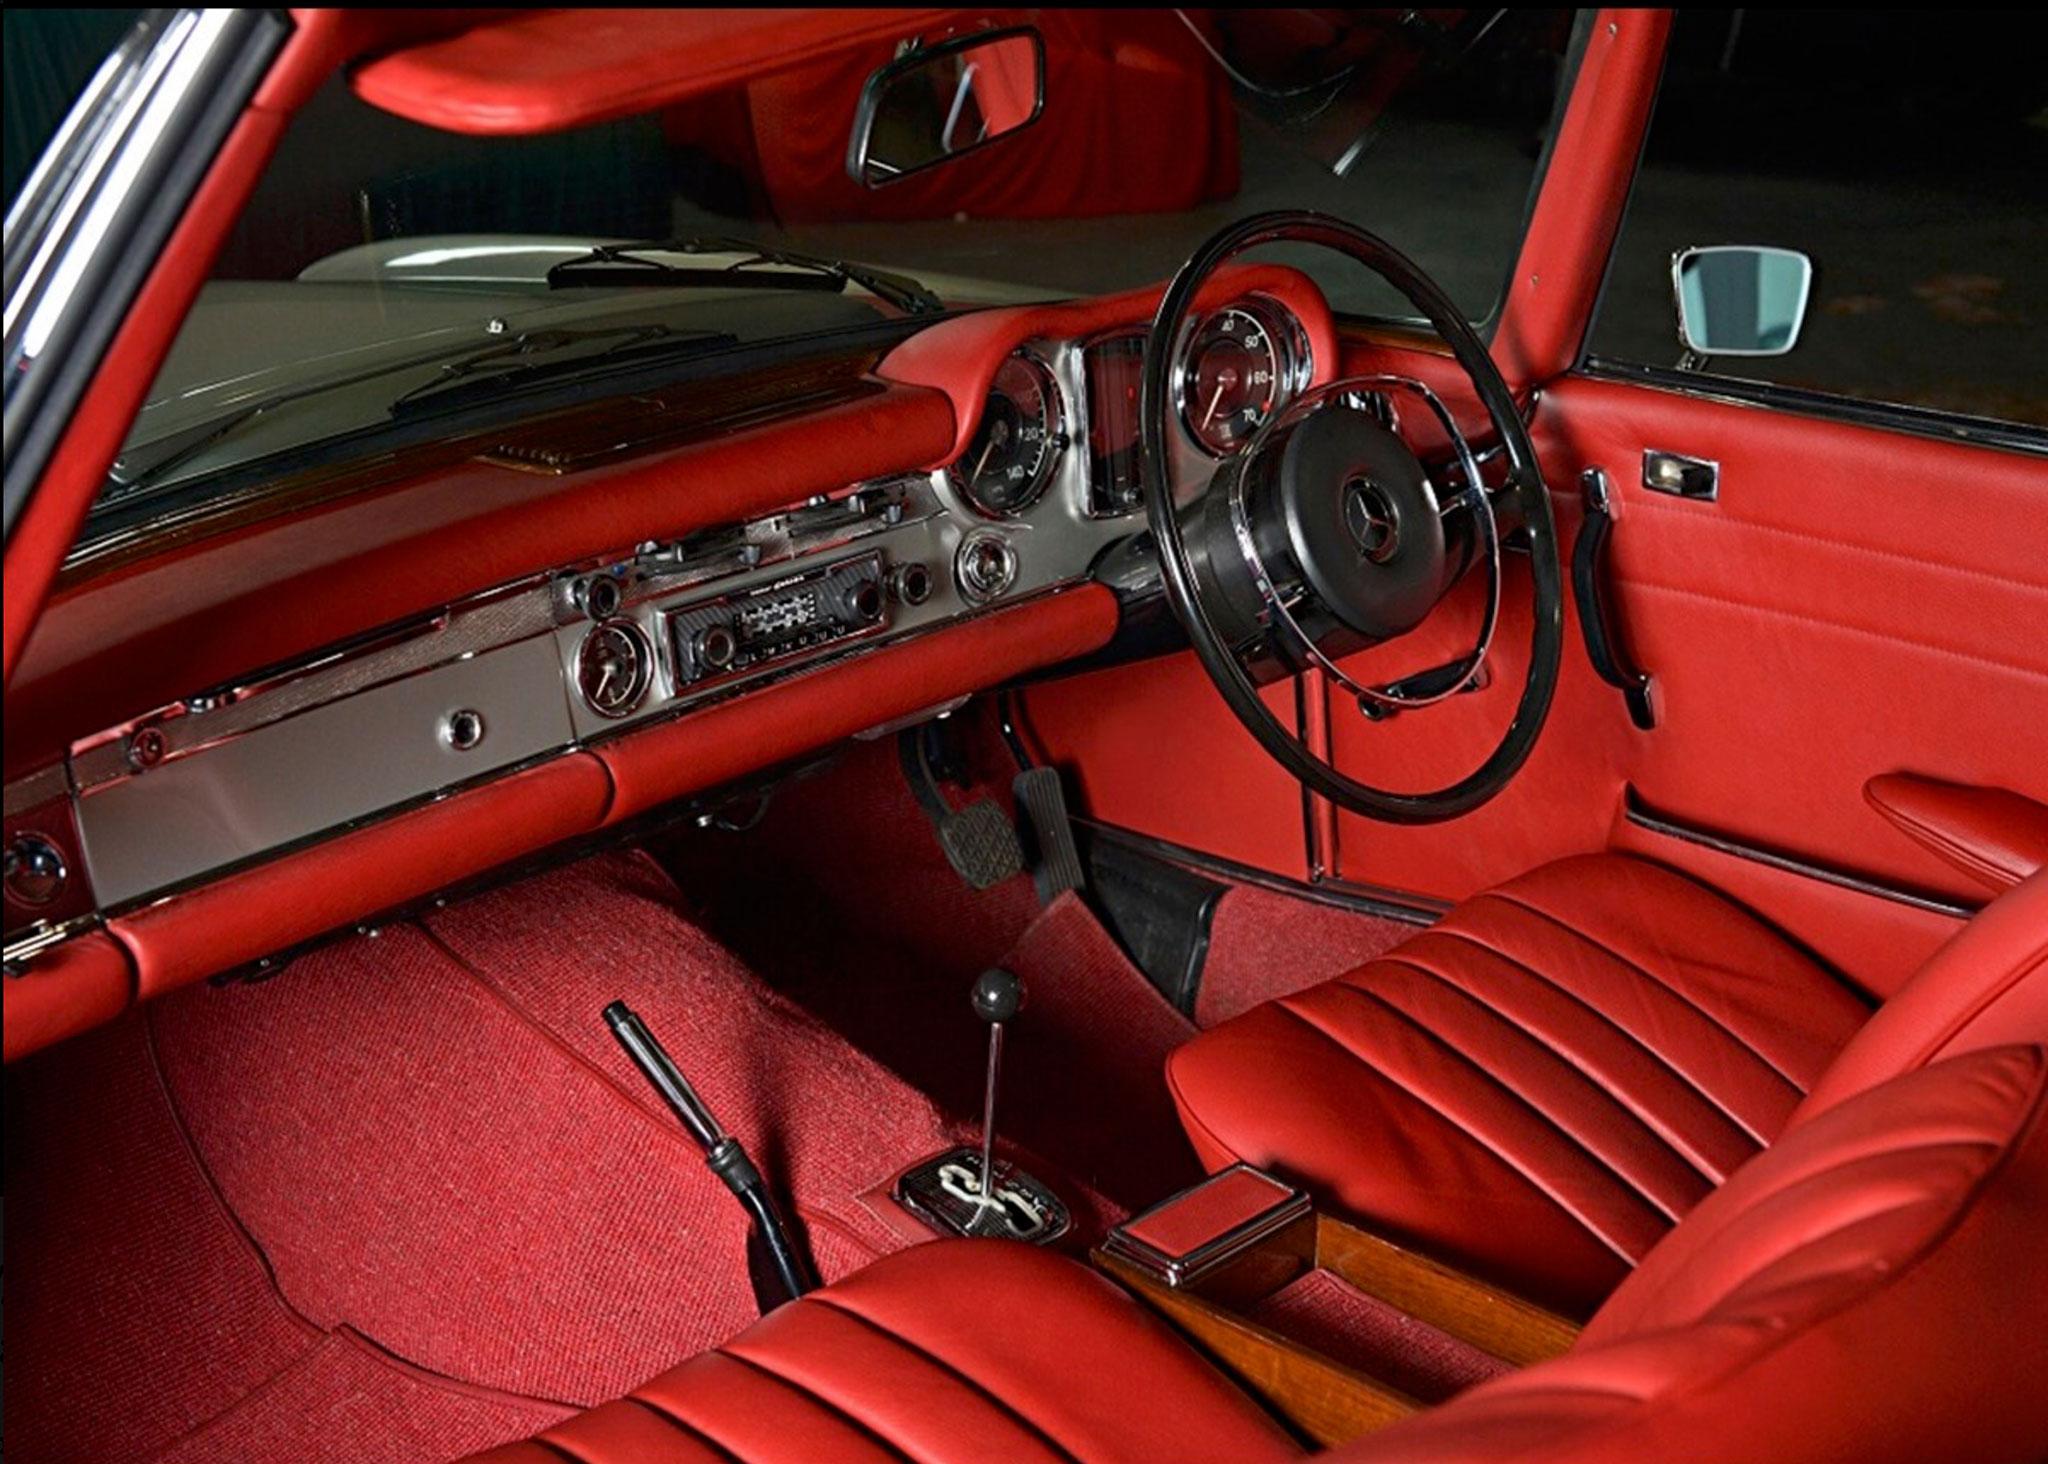 1969 Mercedes-Benz 280 SL Pagode cuir rouge - Résultats Ascot avril 2021.